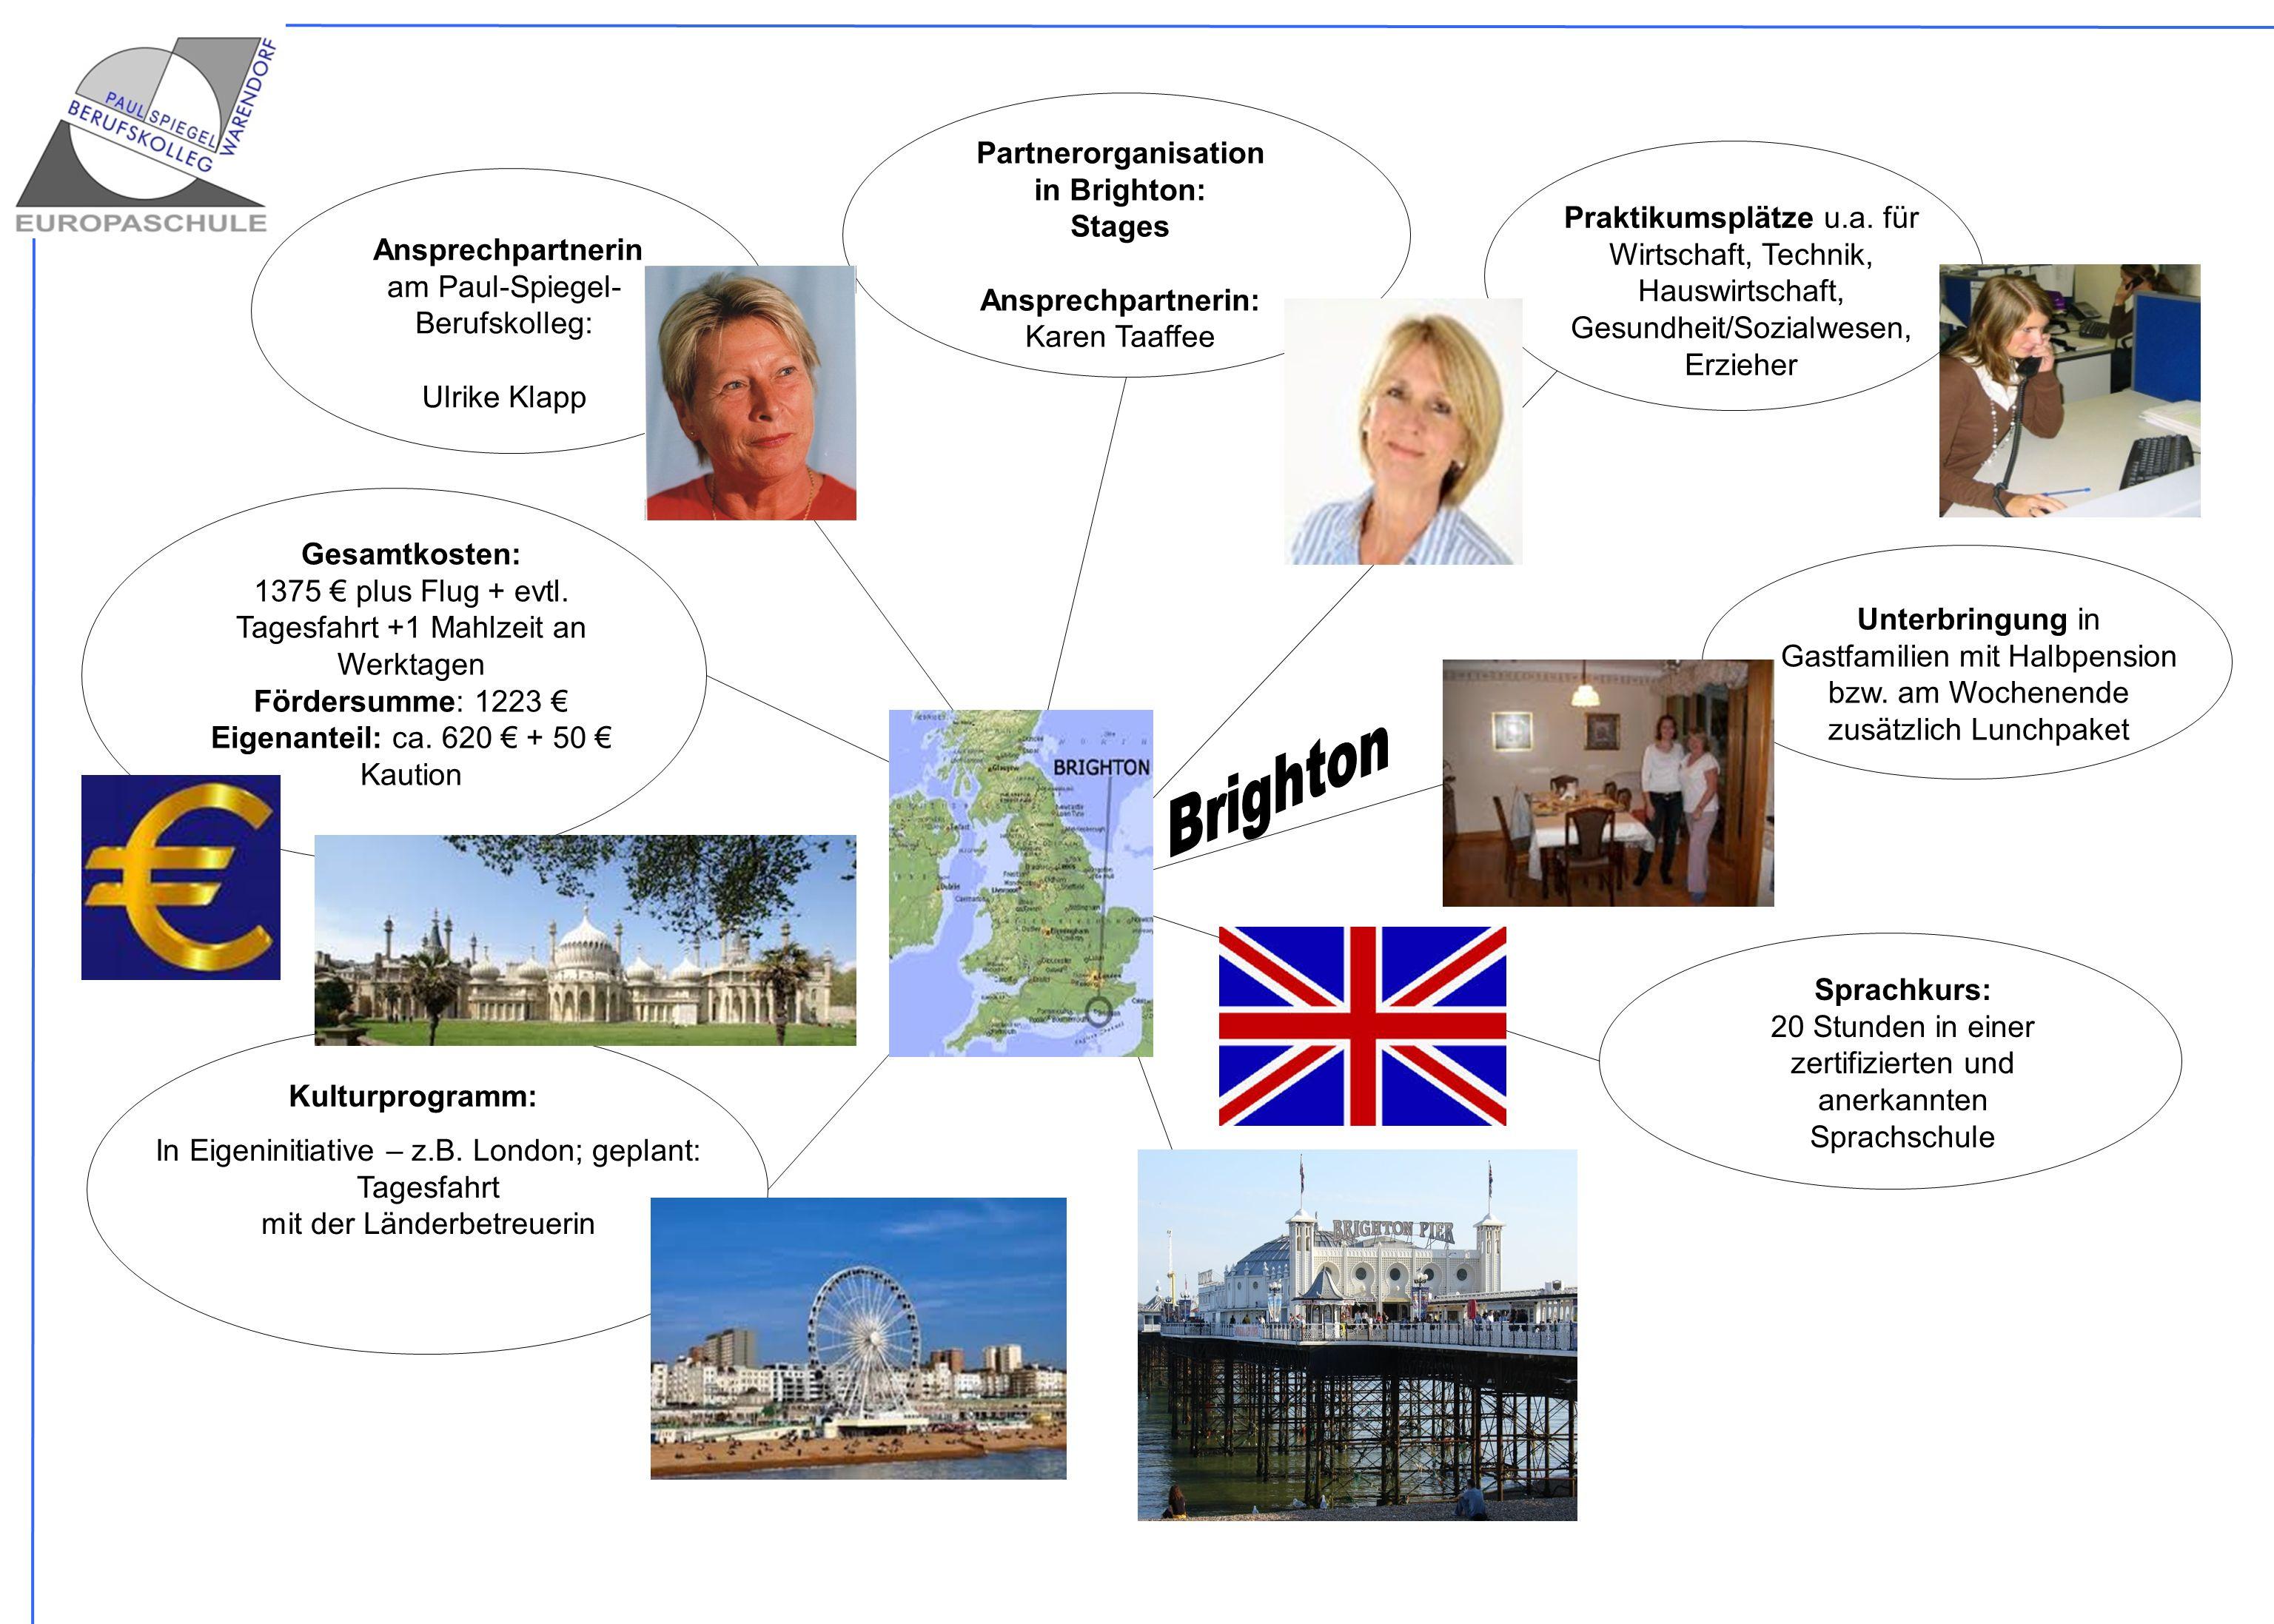 Partnerorganisation in Bordeaux: Cap Ulysse Ansprechpartnerin: Elisabeth Silva Praktikumsplätze u.a.